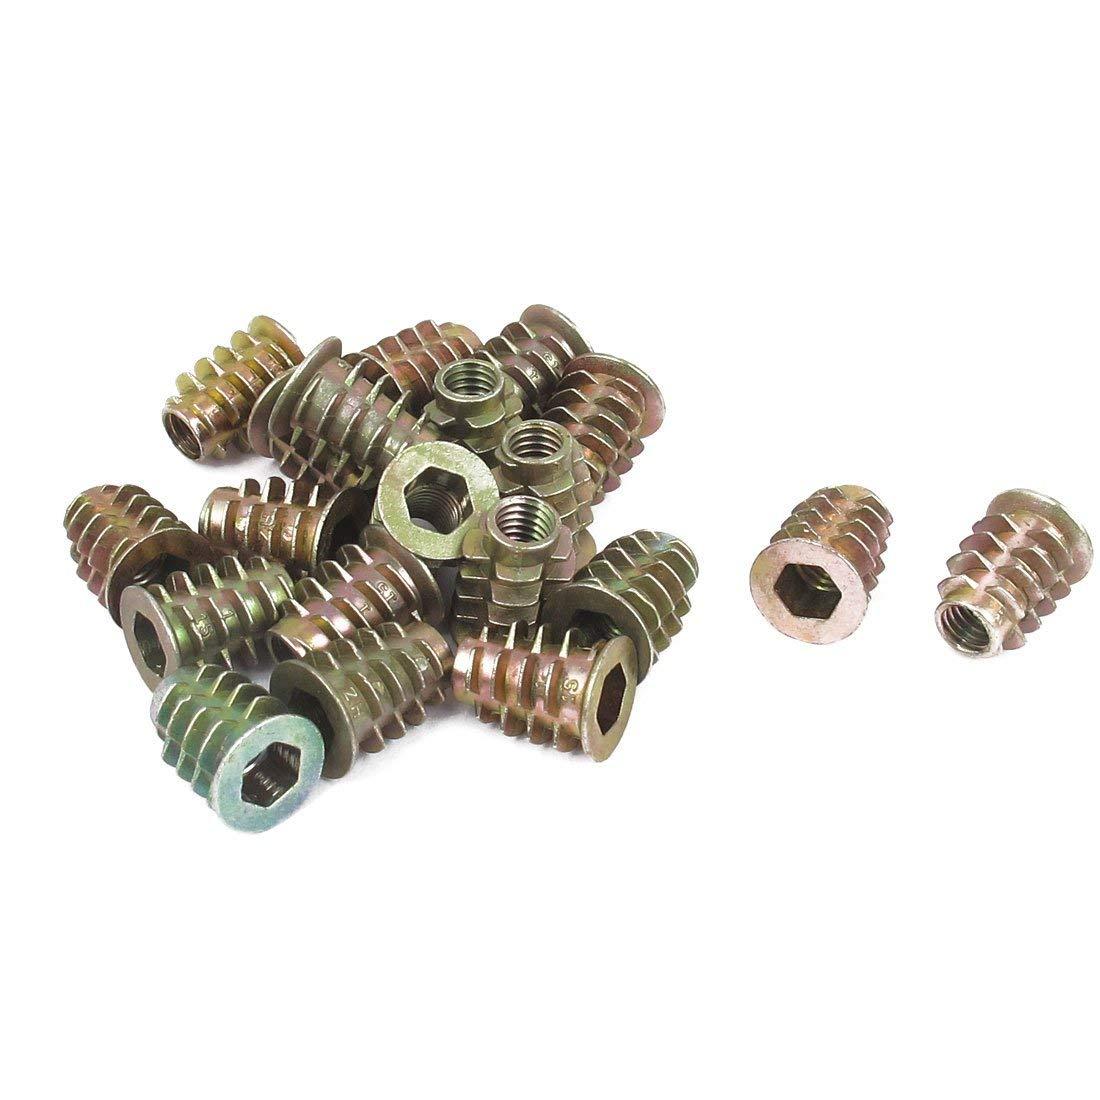 uxcell M6x10mm Wood Insert E-Nut Screws Furniture Fittings Zinc Alloy Bronze Tone 30pcs